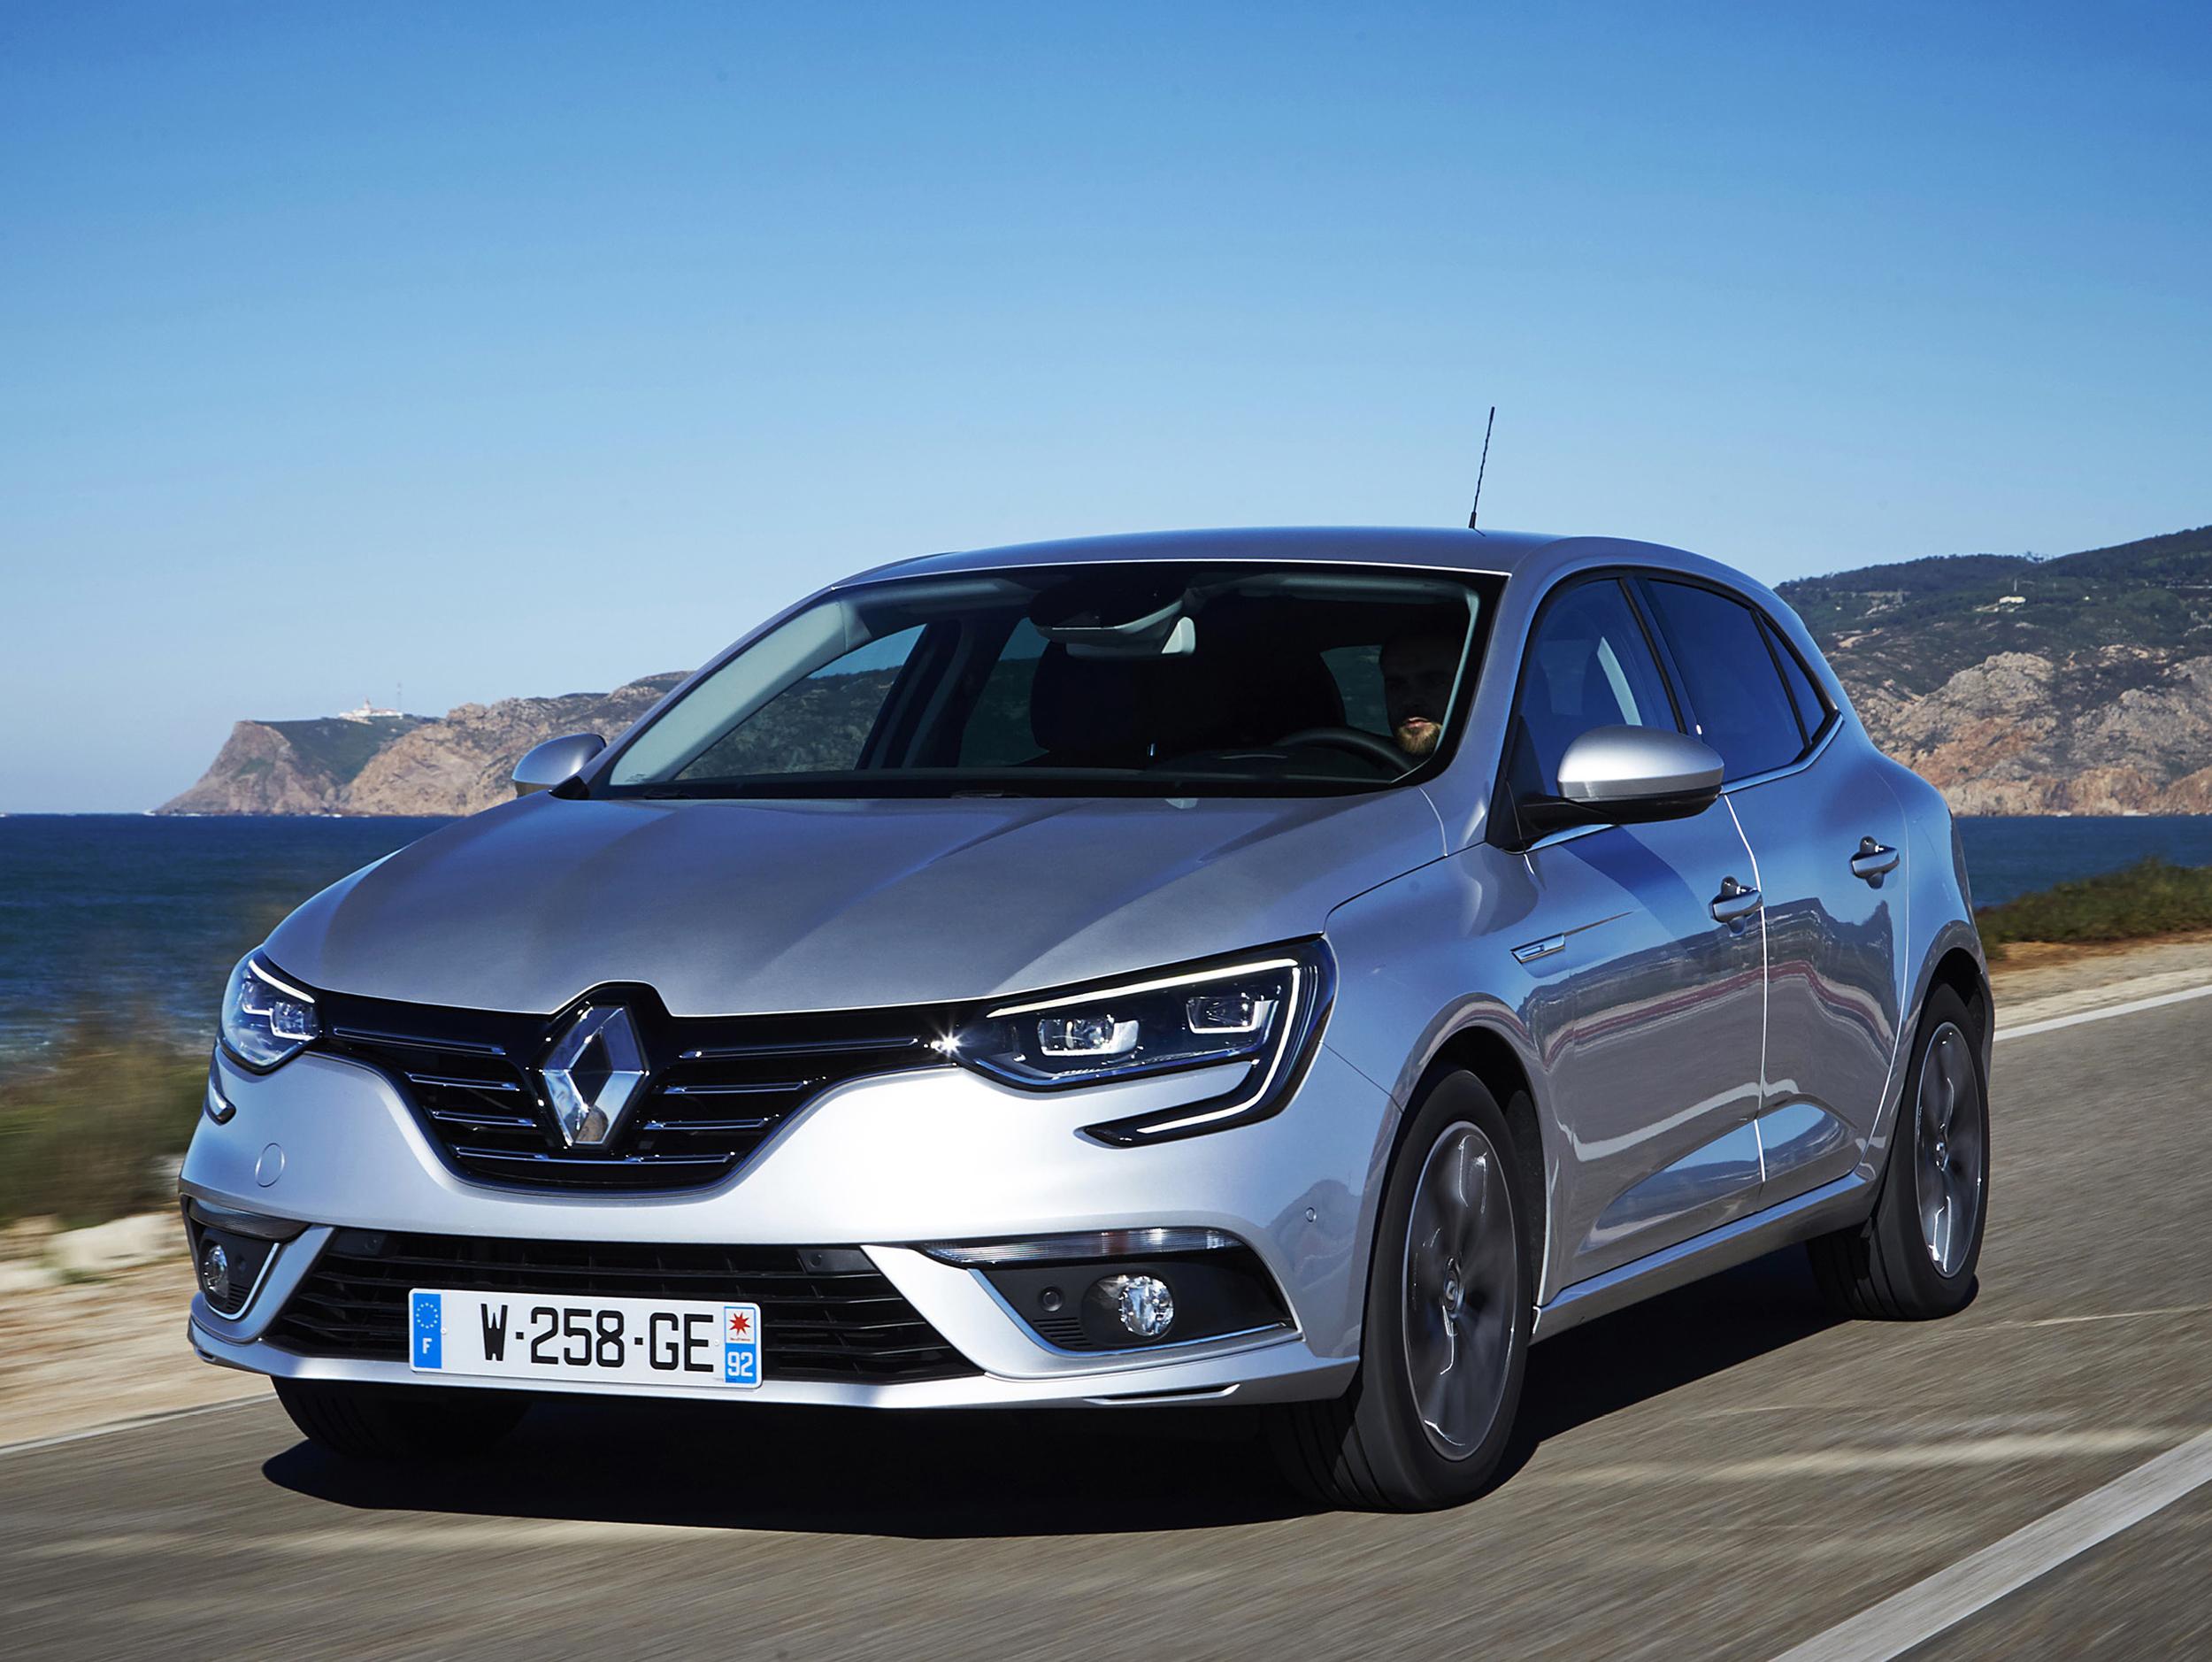 Renault reveals more new Megane details